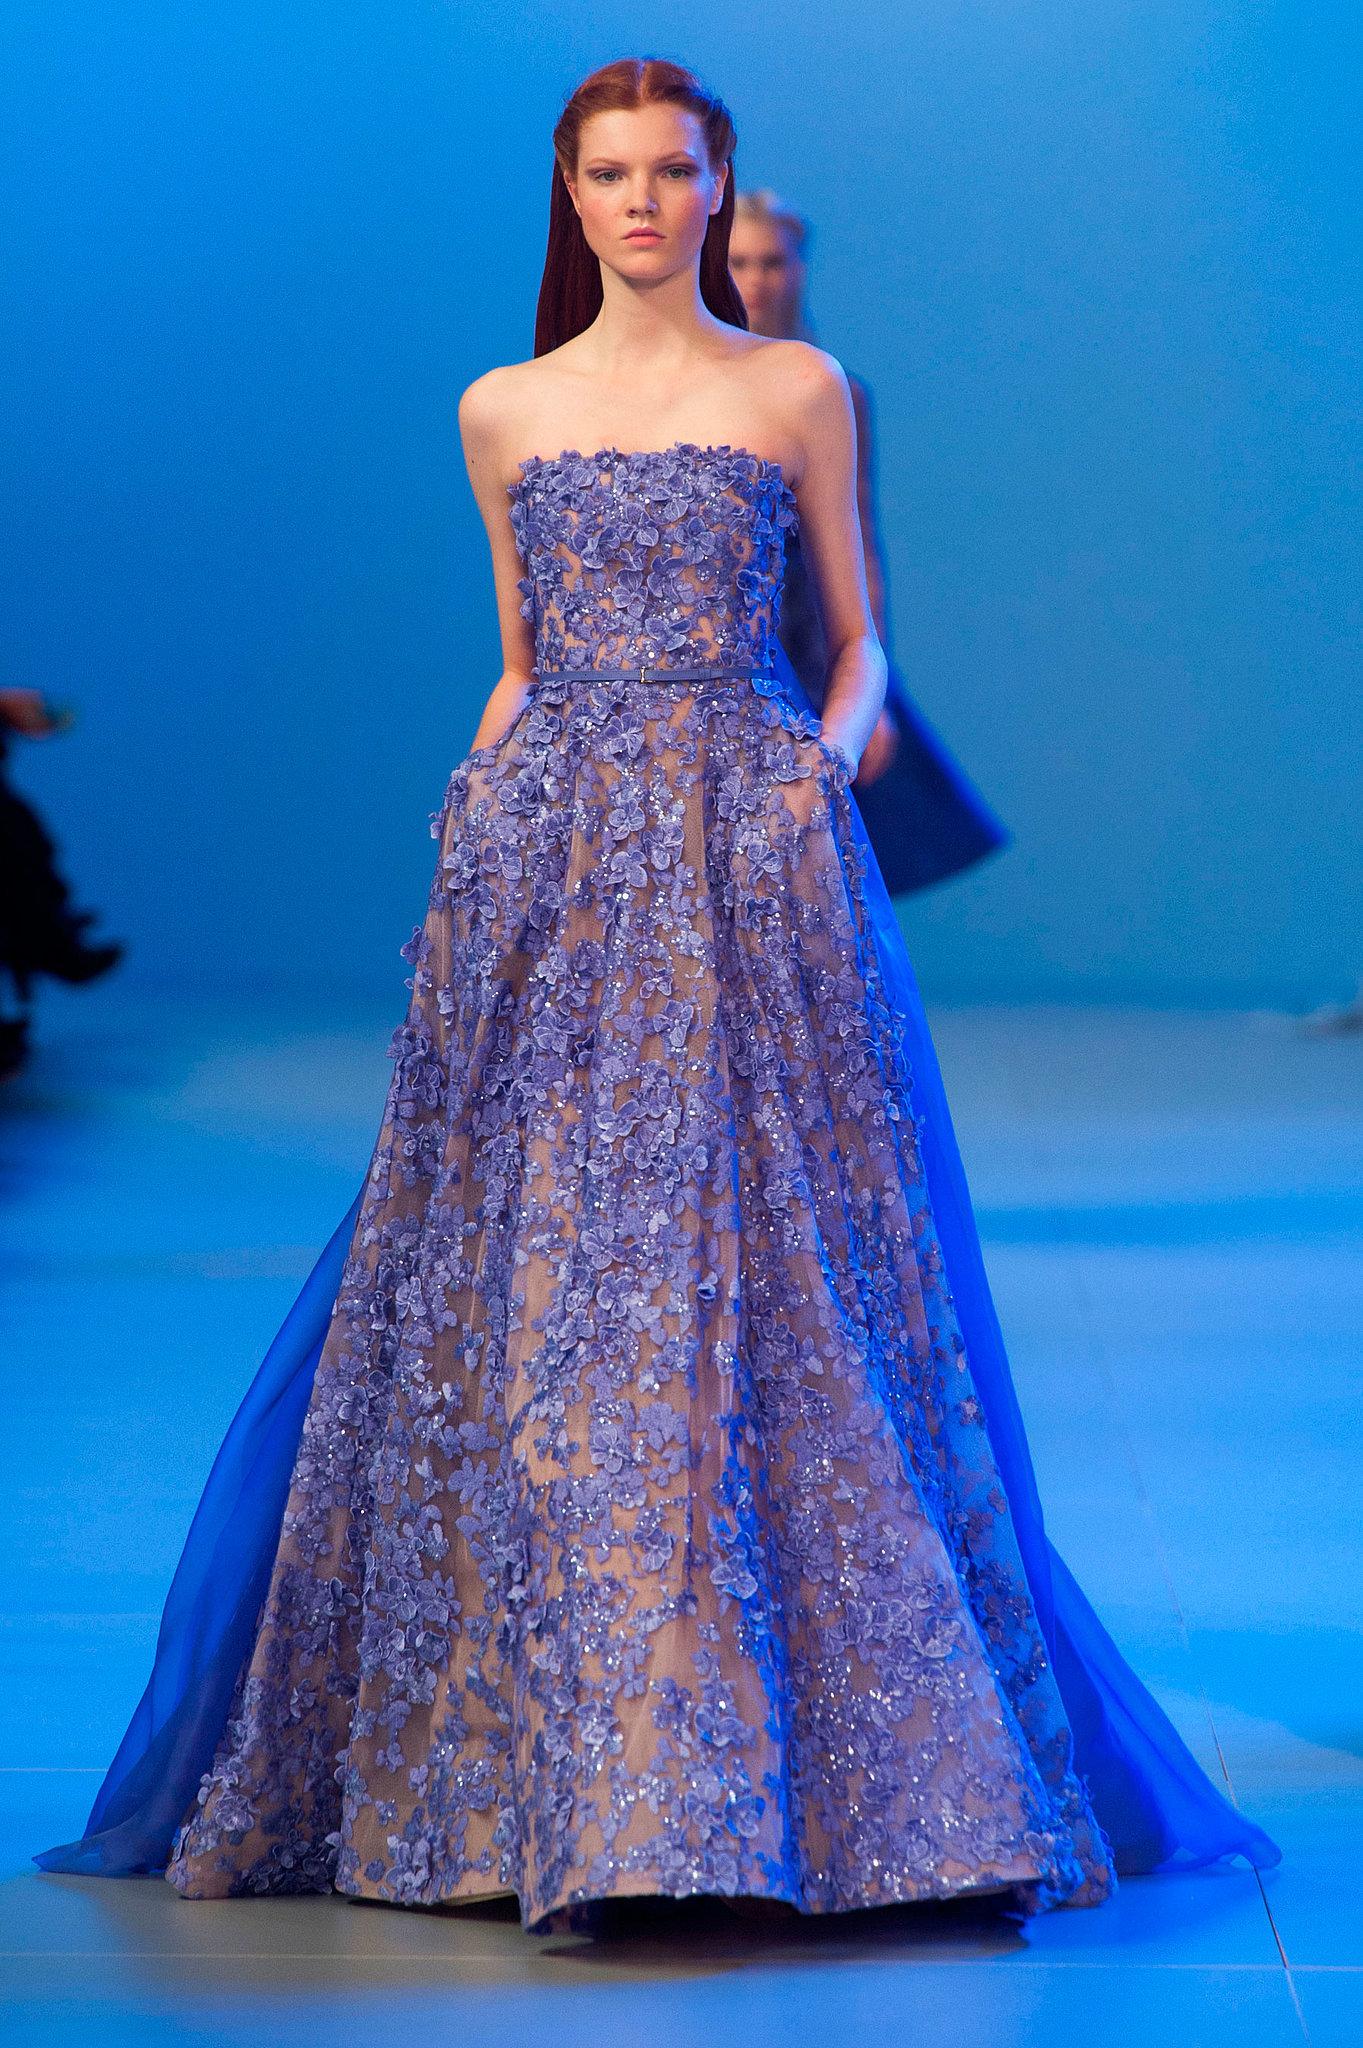 aishwarya rai in elie saab couture at 2015 amfar cinema against aids gala fashionsizzle. Black Bedroom Furniture Sets. Home Design Ideas